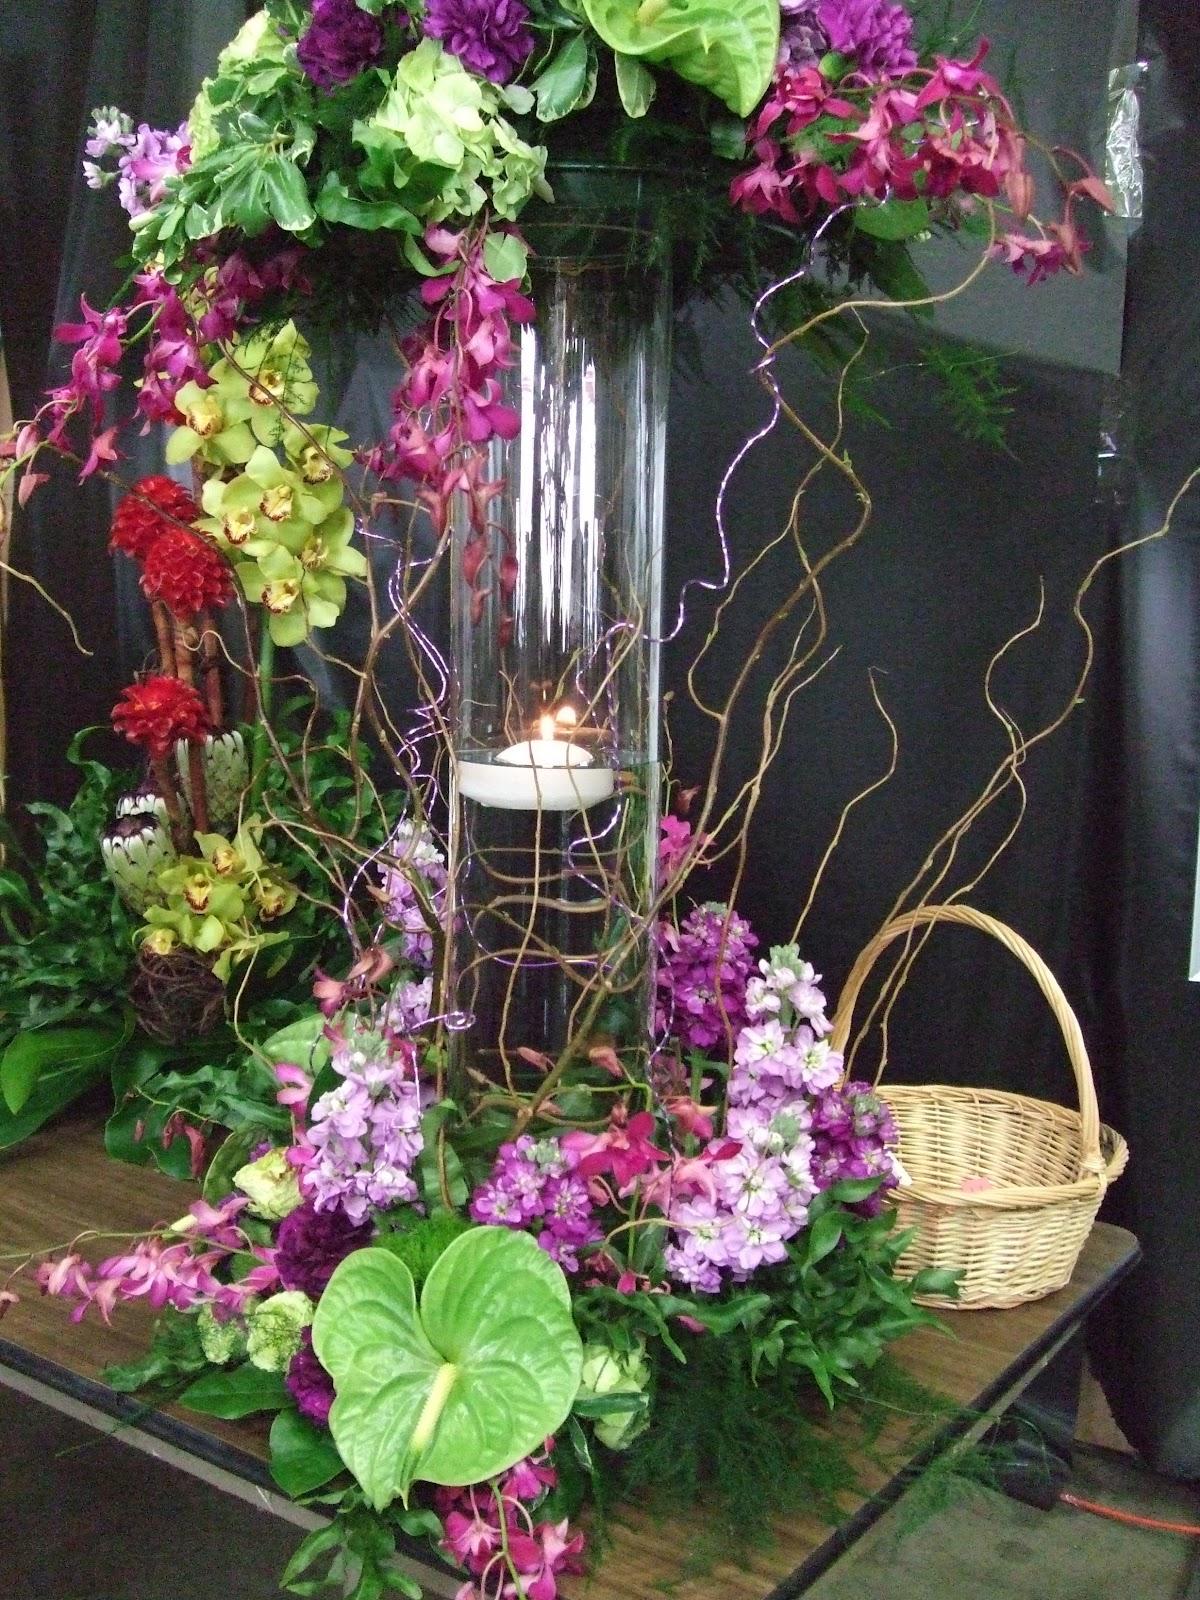 Floral Ambiance By Deborah Di Bella AIFD Oasis Design Show W Loann Burke AIFD 4 22 12